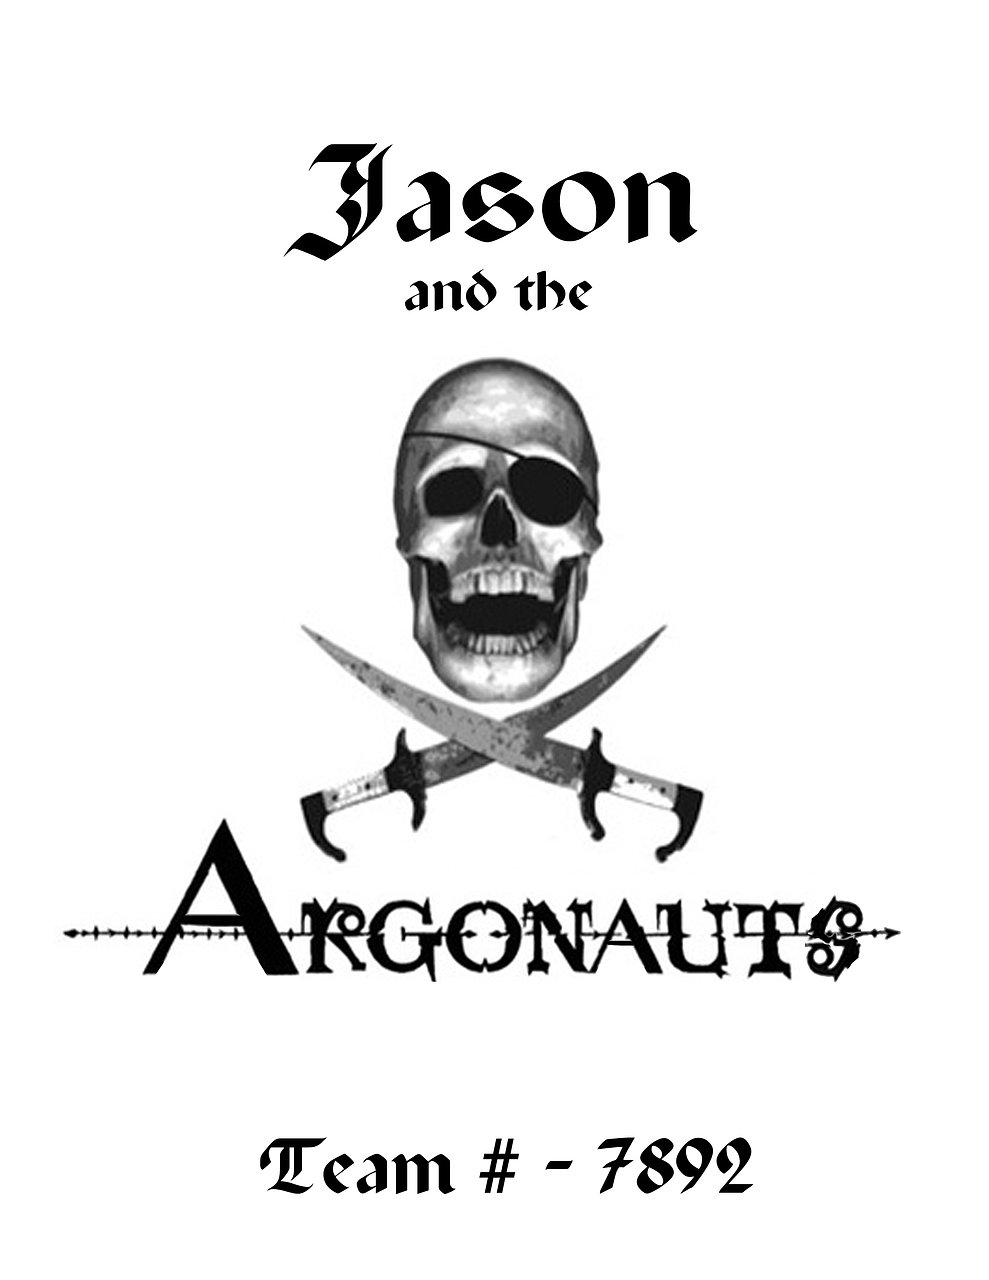 Jason+and+the+Argonauts+copy.jpg